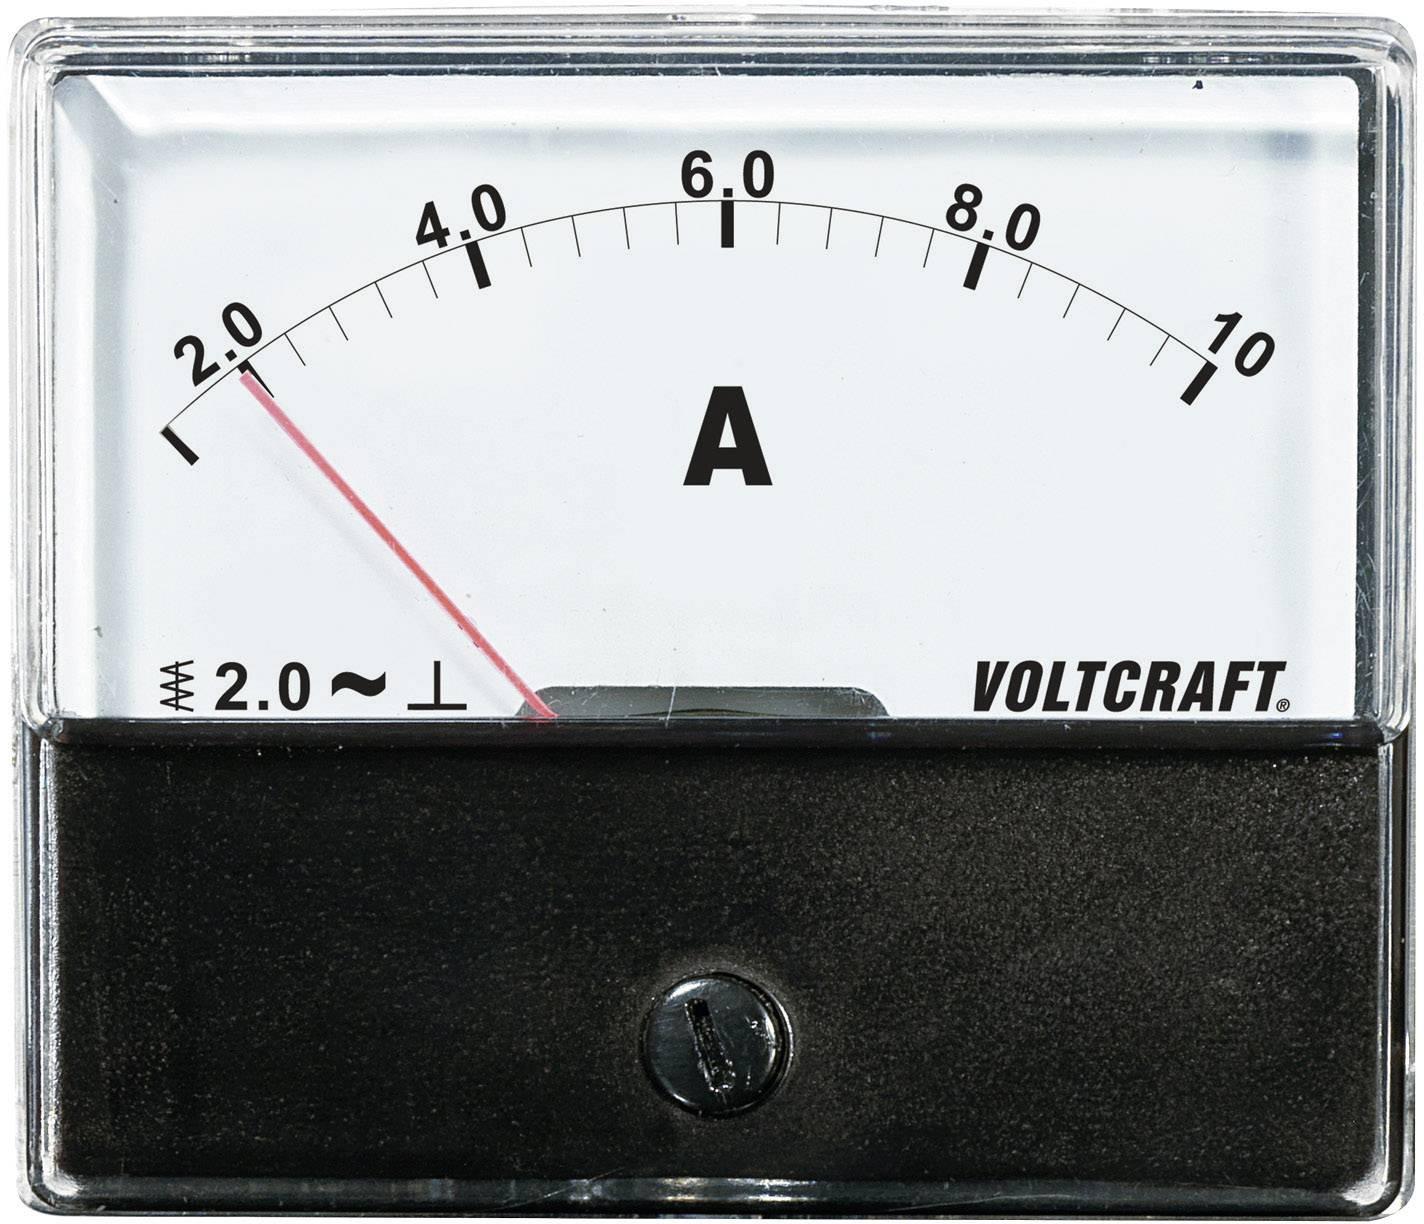 Panelové meradlo Voltcraft AM-70x60, 10 A